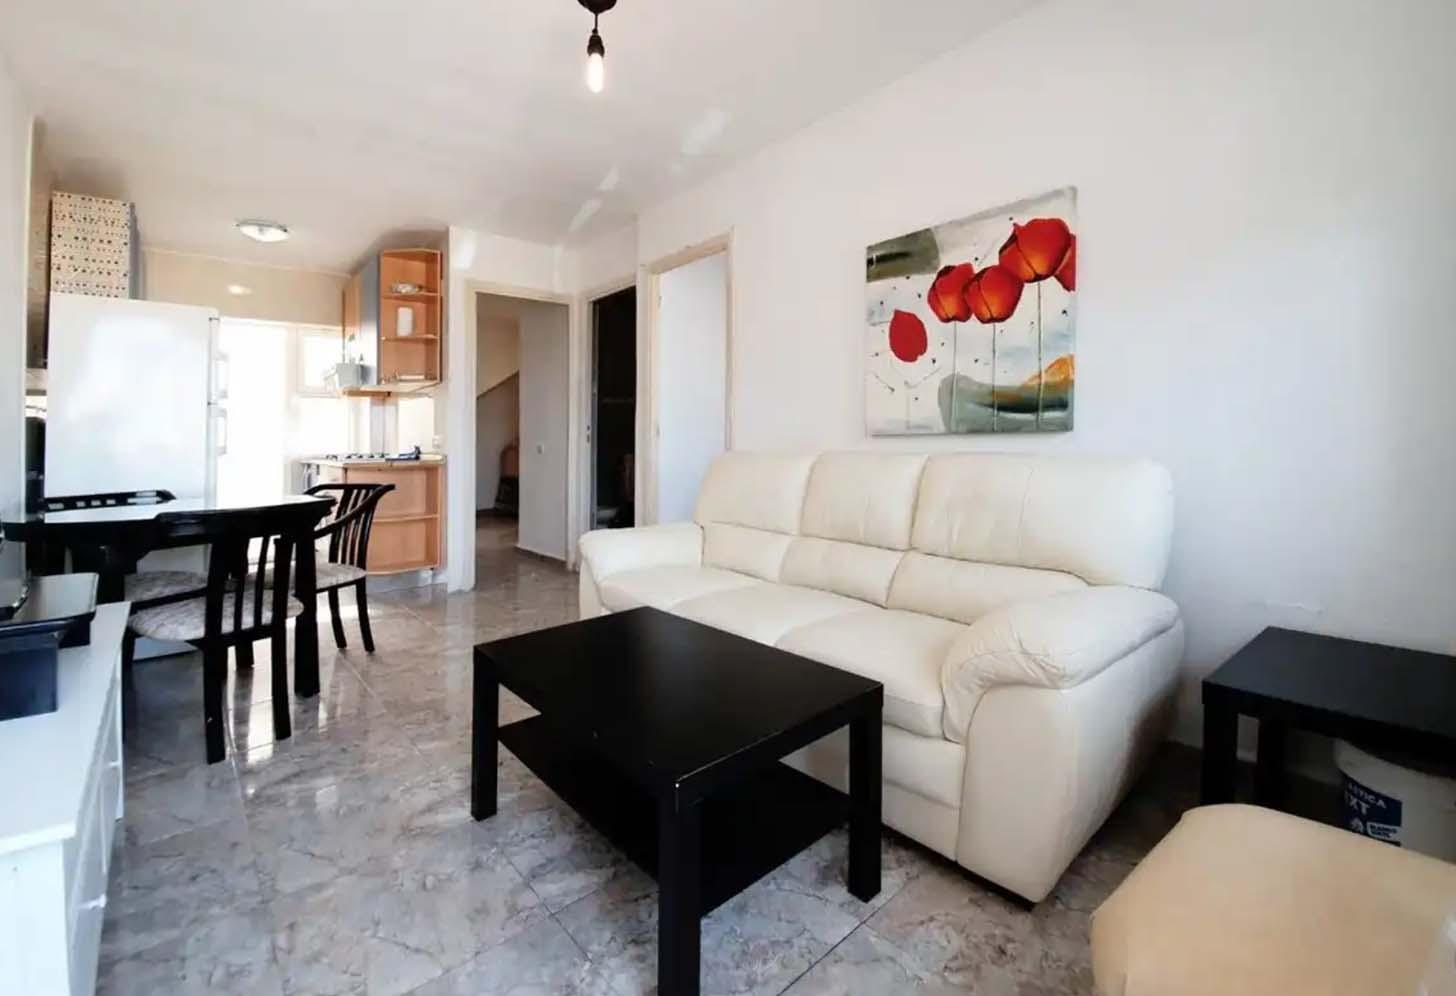 acheter un appartement sierramar 004 salon